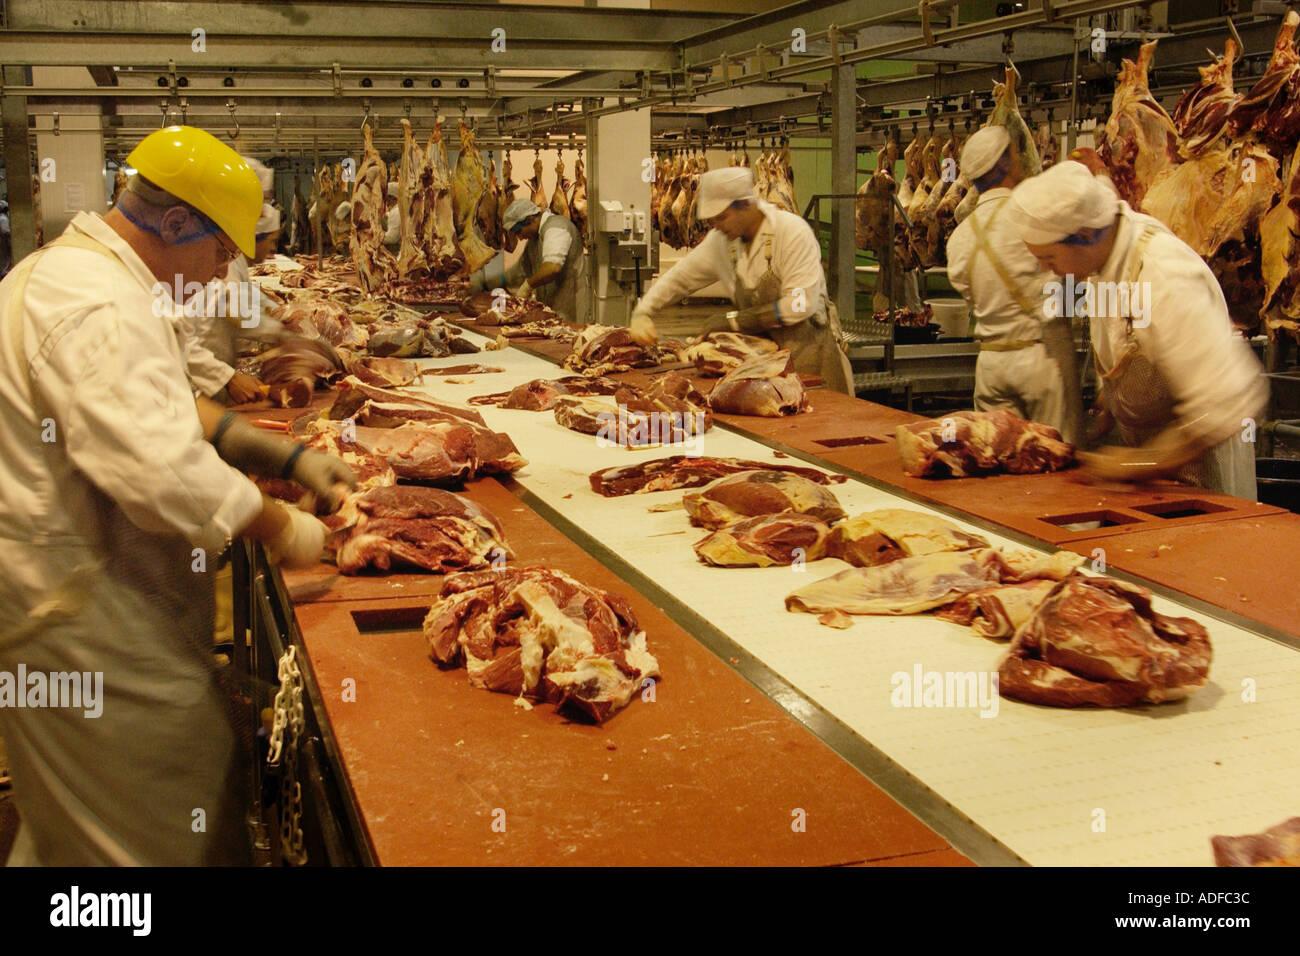 processing-welsh-beef-carcasses-at-st-merryn-foods-abattoir-merthyr-ADFC3C.jpg